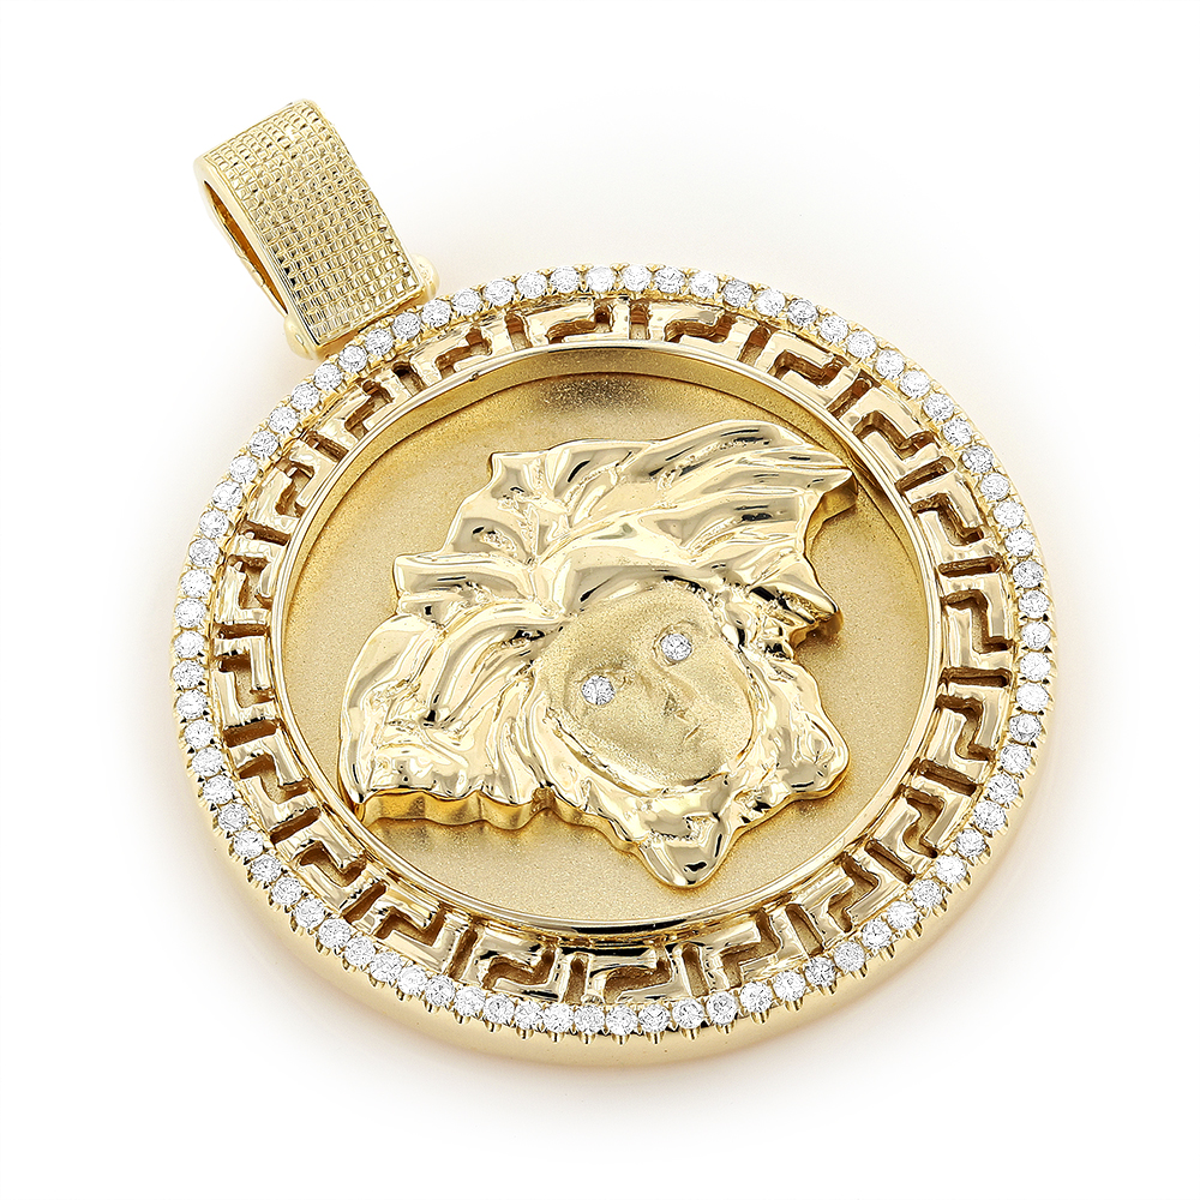 10K Gold Versace Style Diamond Pendant Medusa Medallion 0.61ct